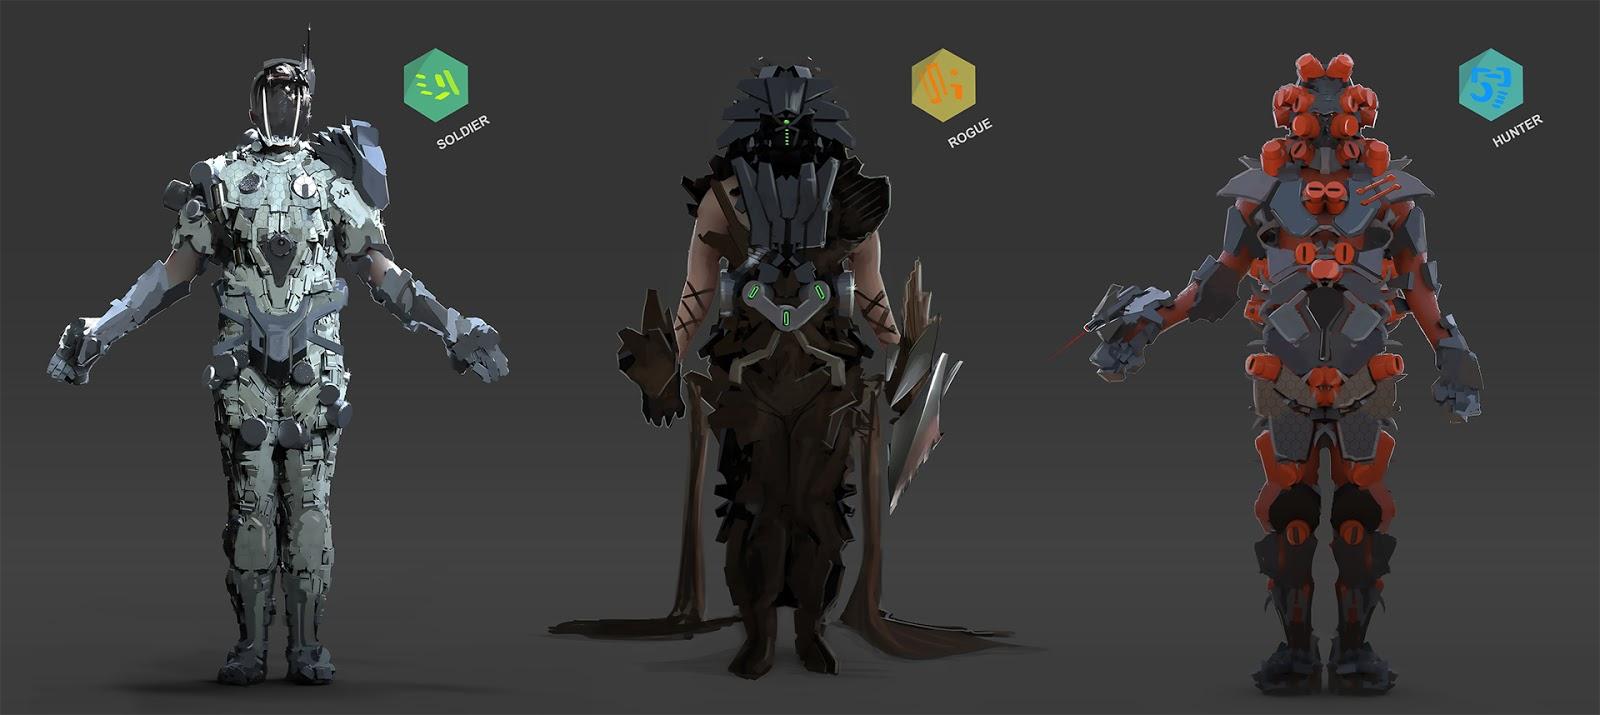 armor_sample_1.jpg